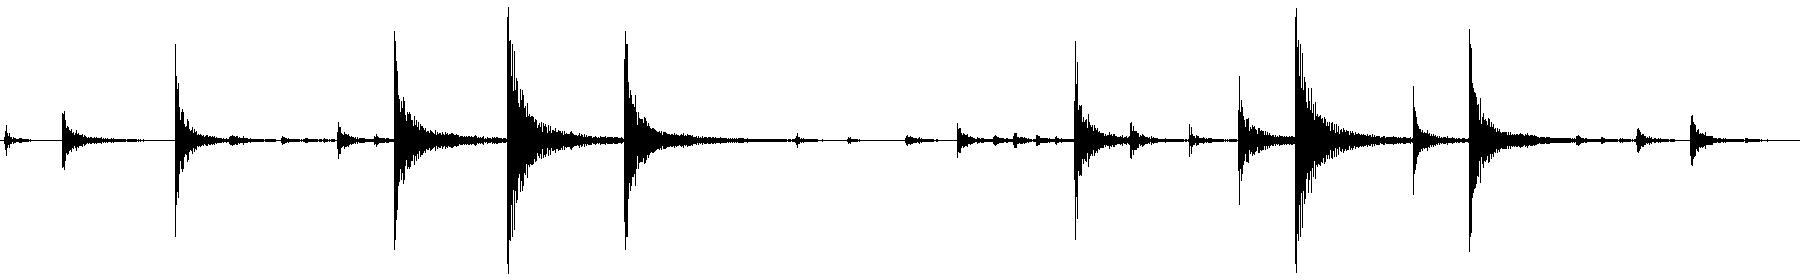 ehu liveperc125 005